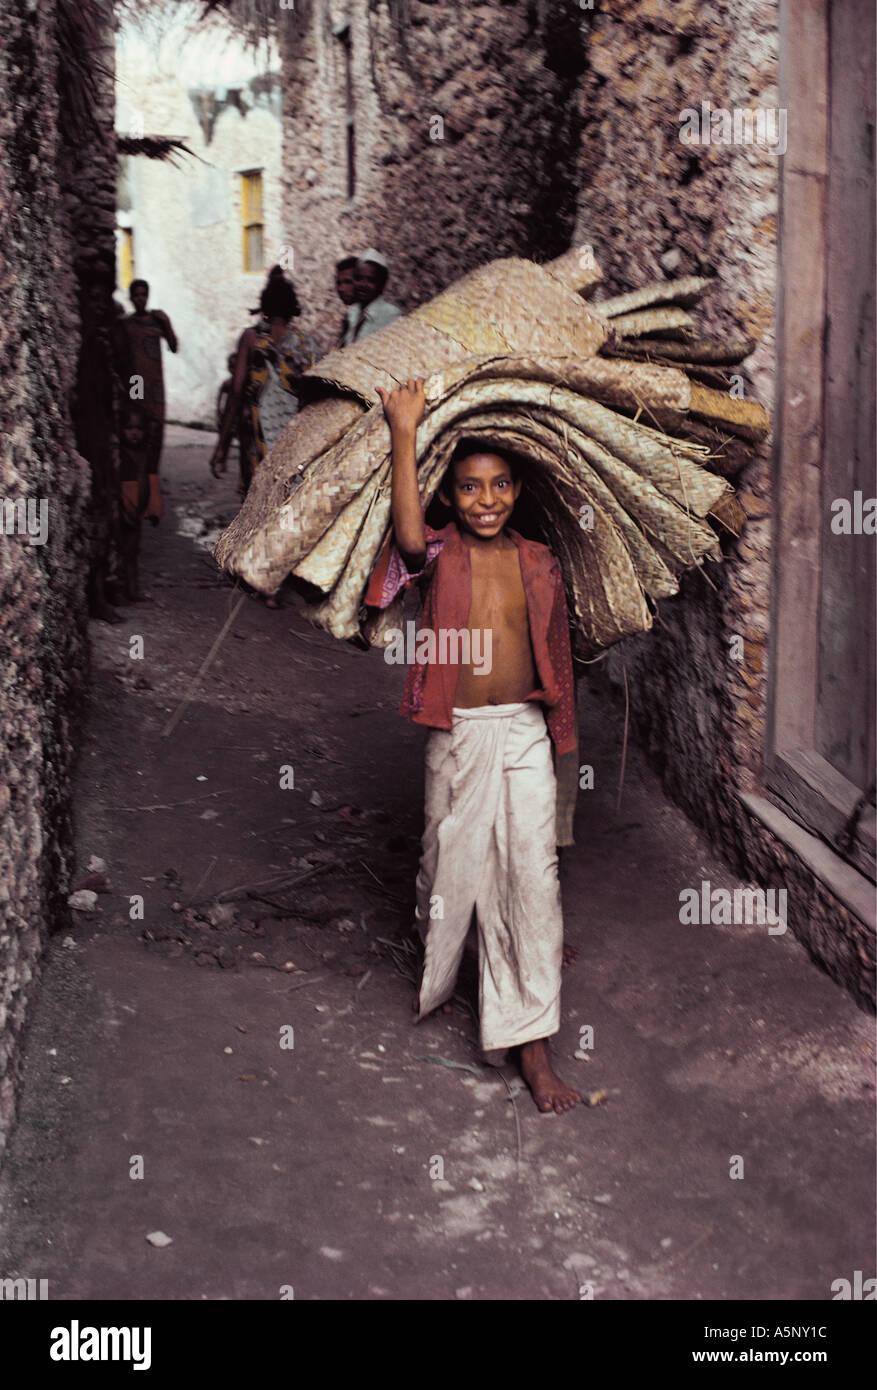 Young boy carrying mats Pate Island Lamu archipelago Kenya coast East Africa - Stock Image